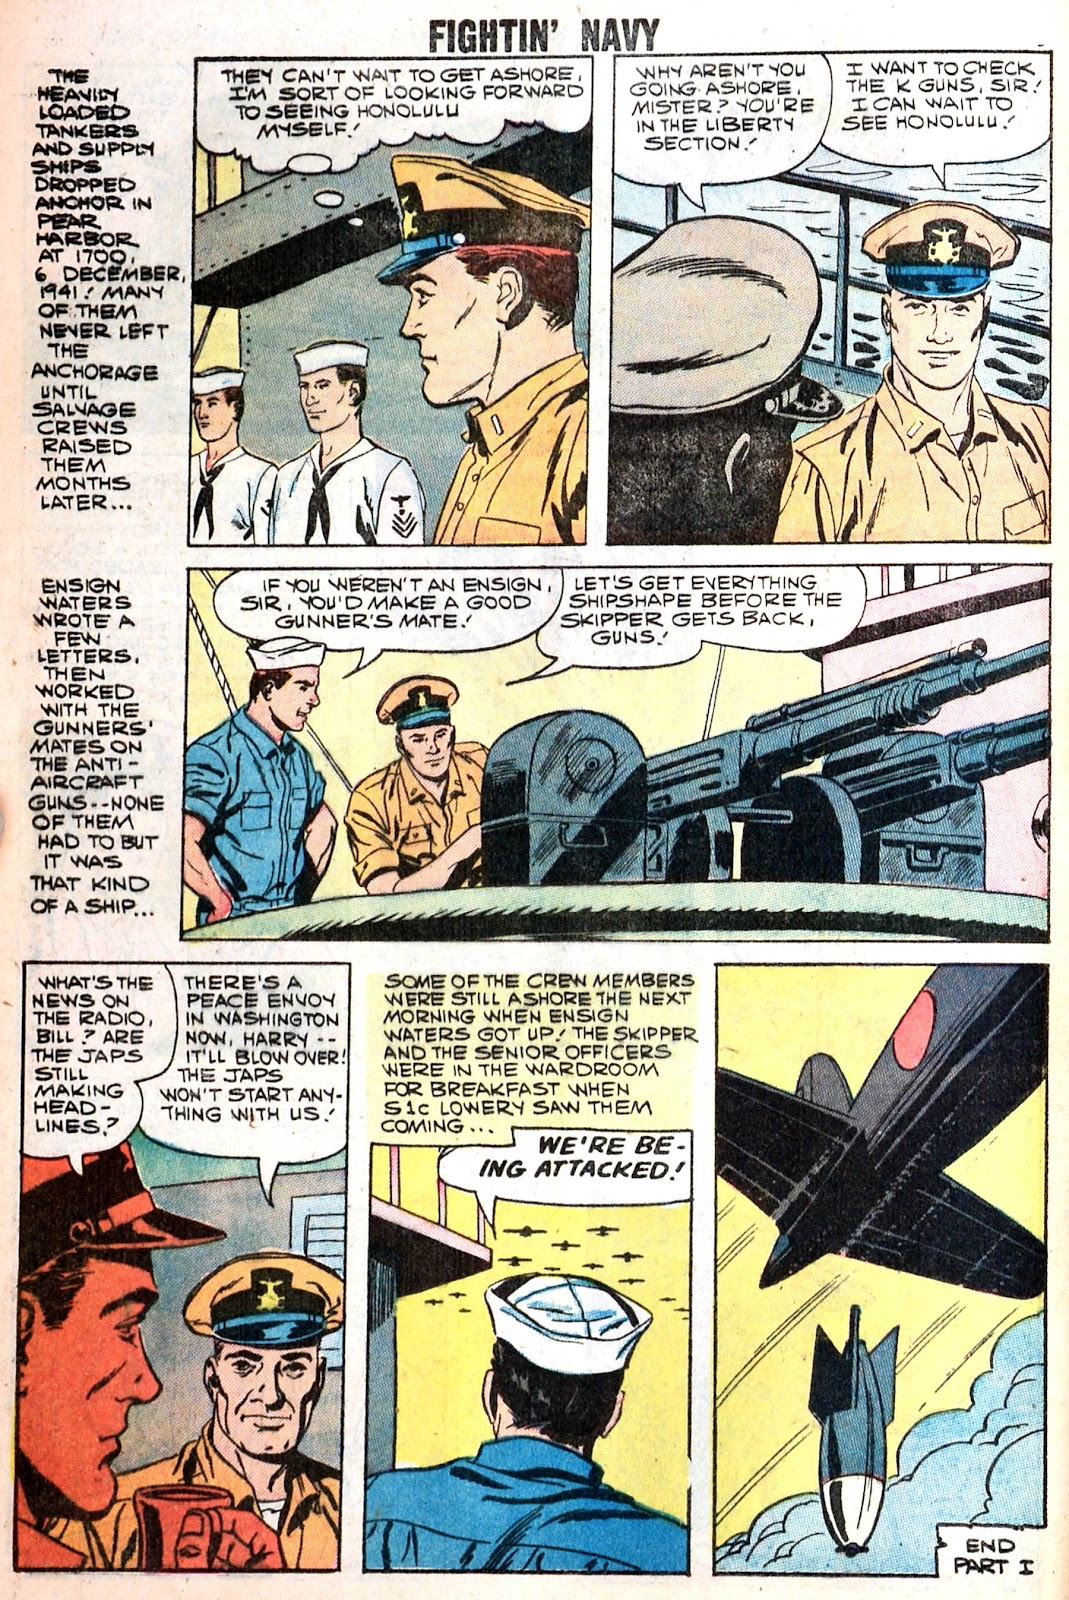 Read online Fightin' Navy comic -  Issue #85 - 8